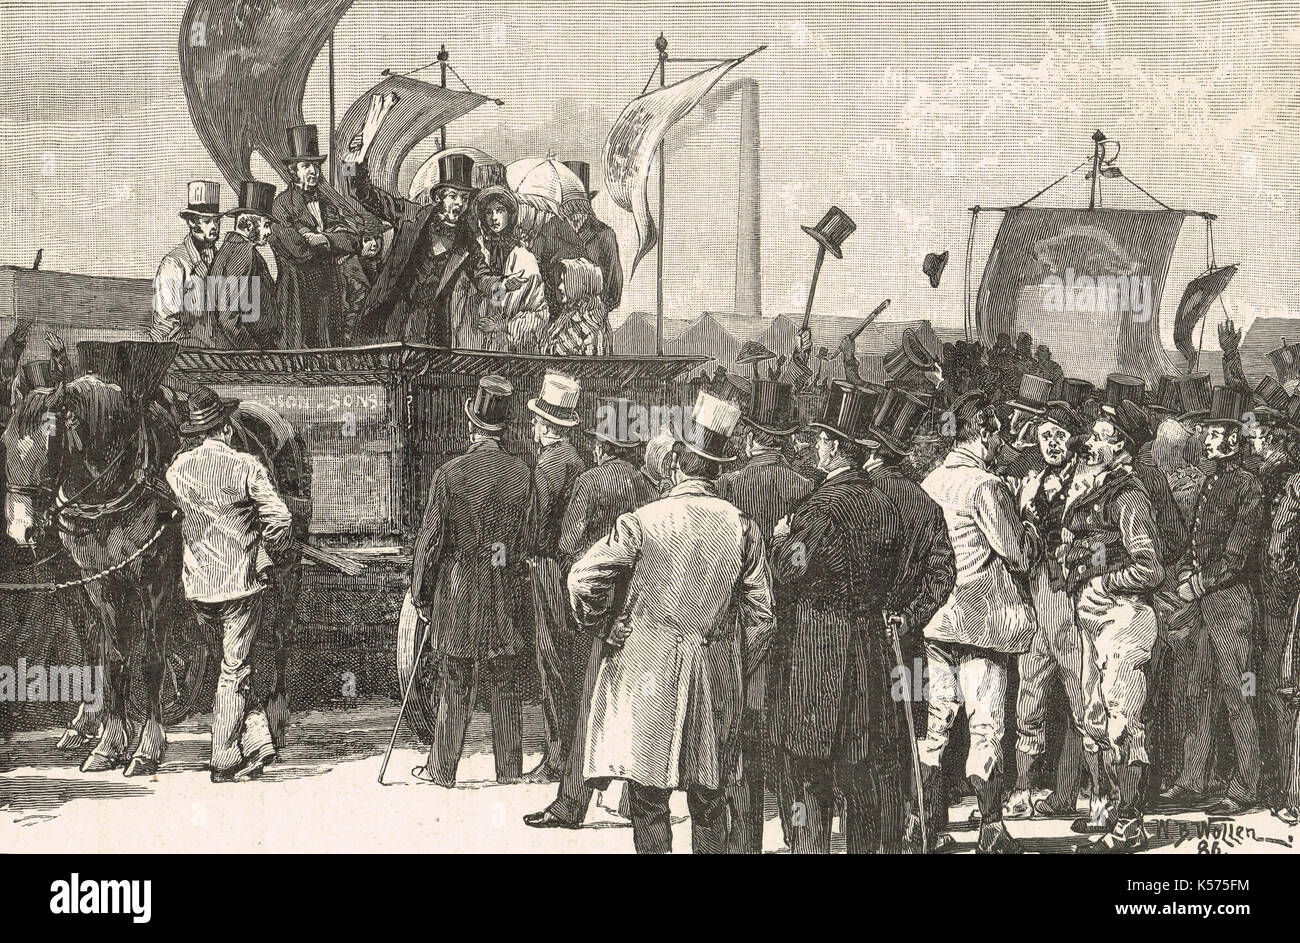 Chartist demonstration, Kennington common, 10 April 1848 - Stock Image